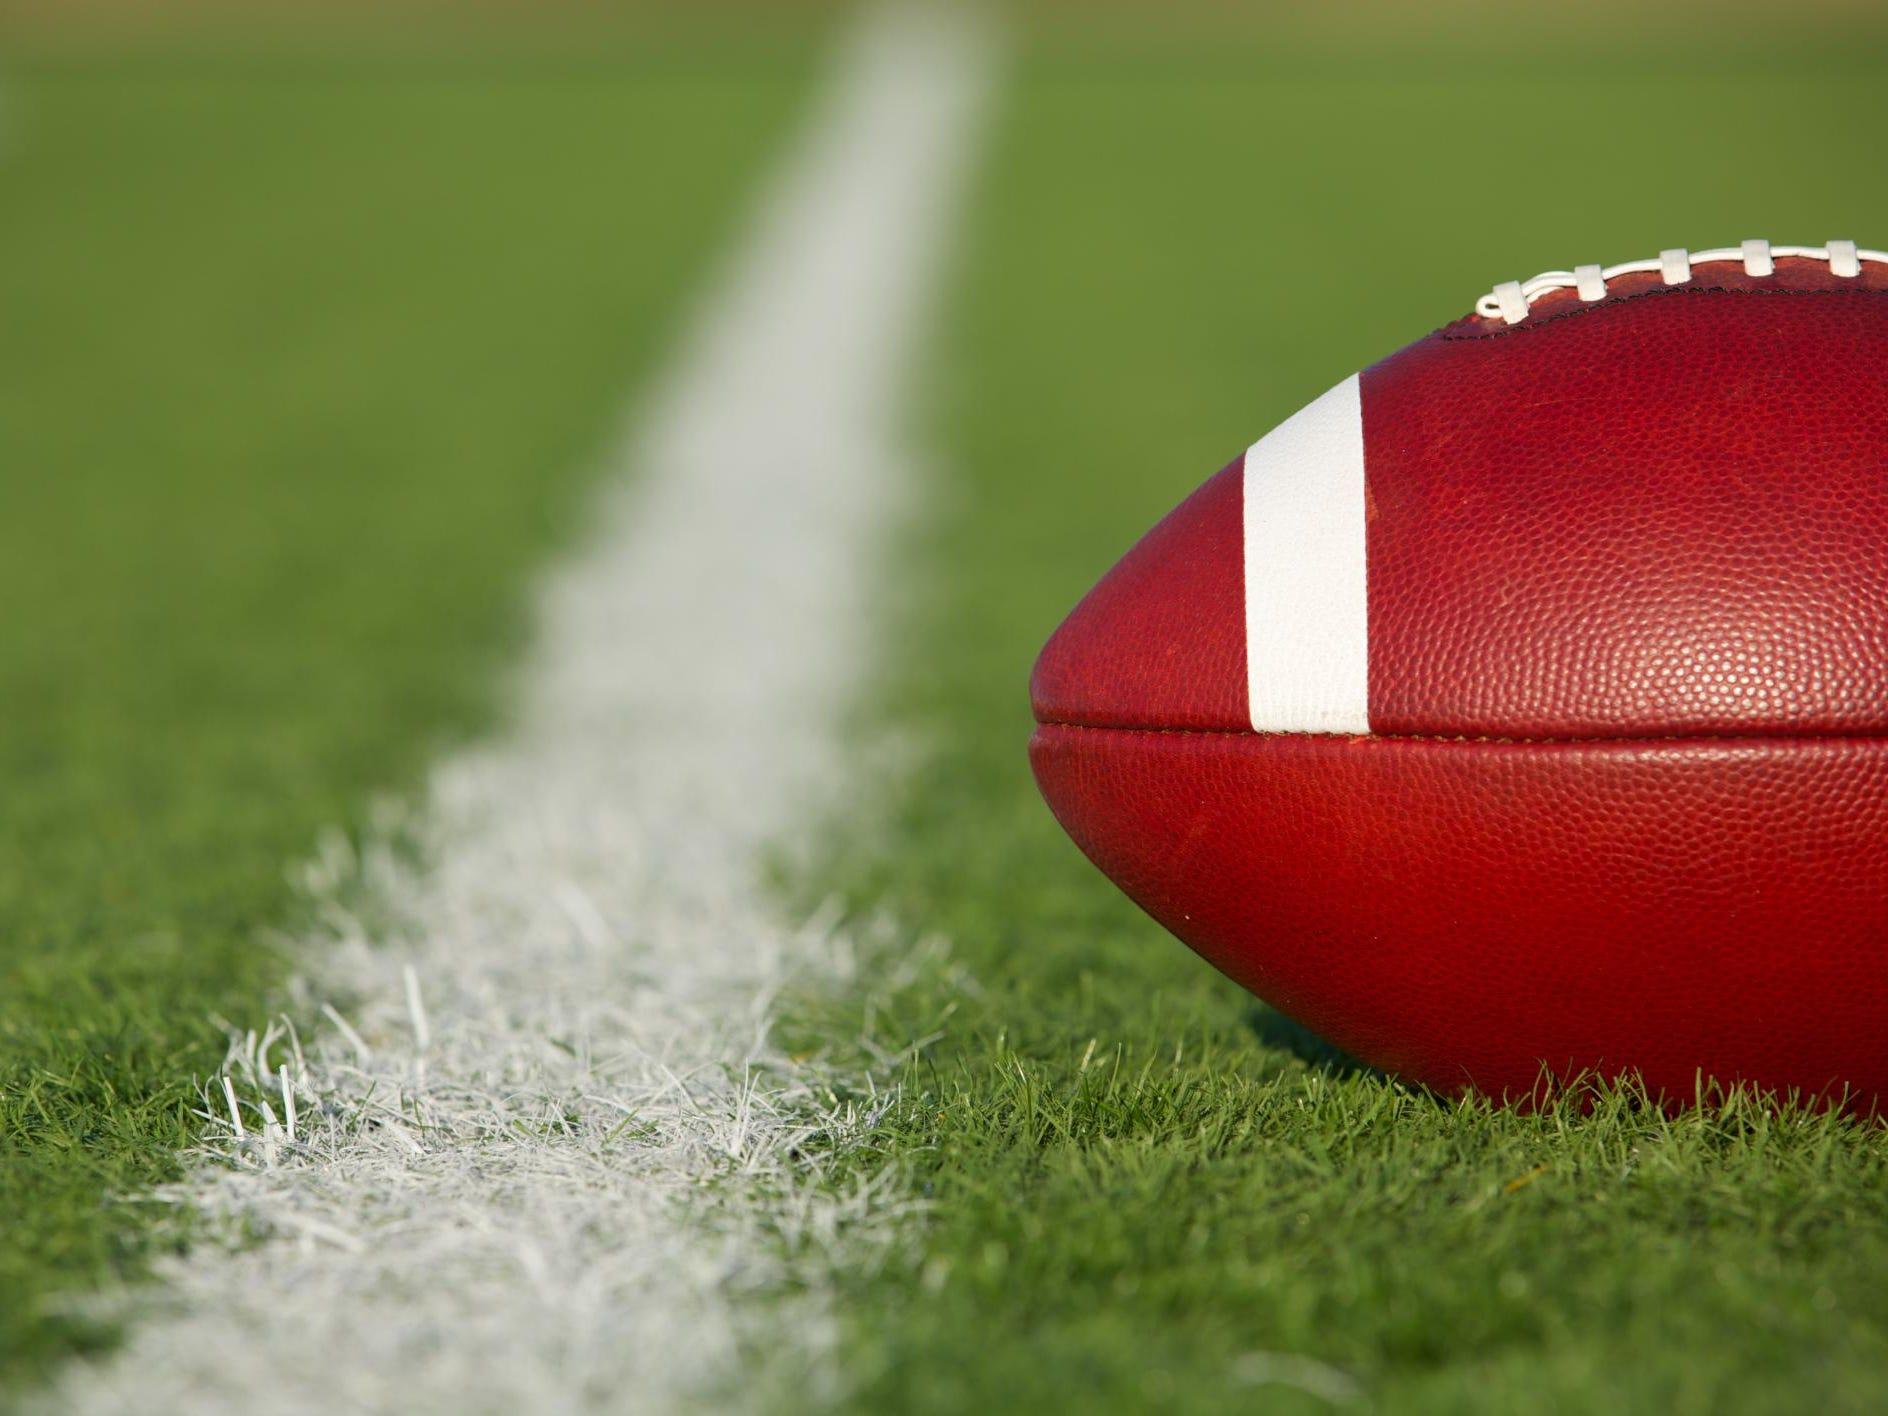 American Football near the Line